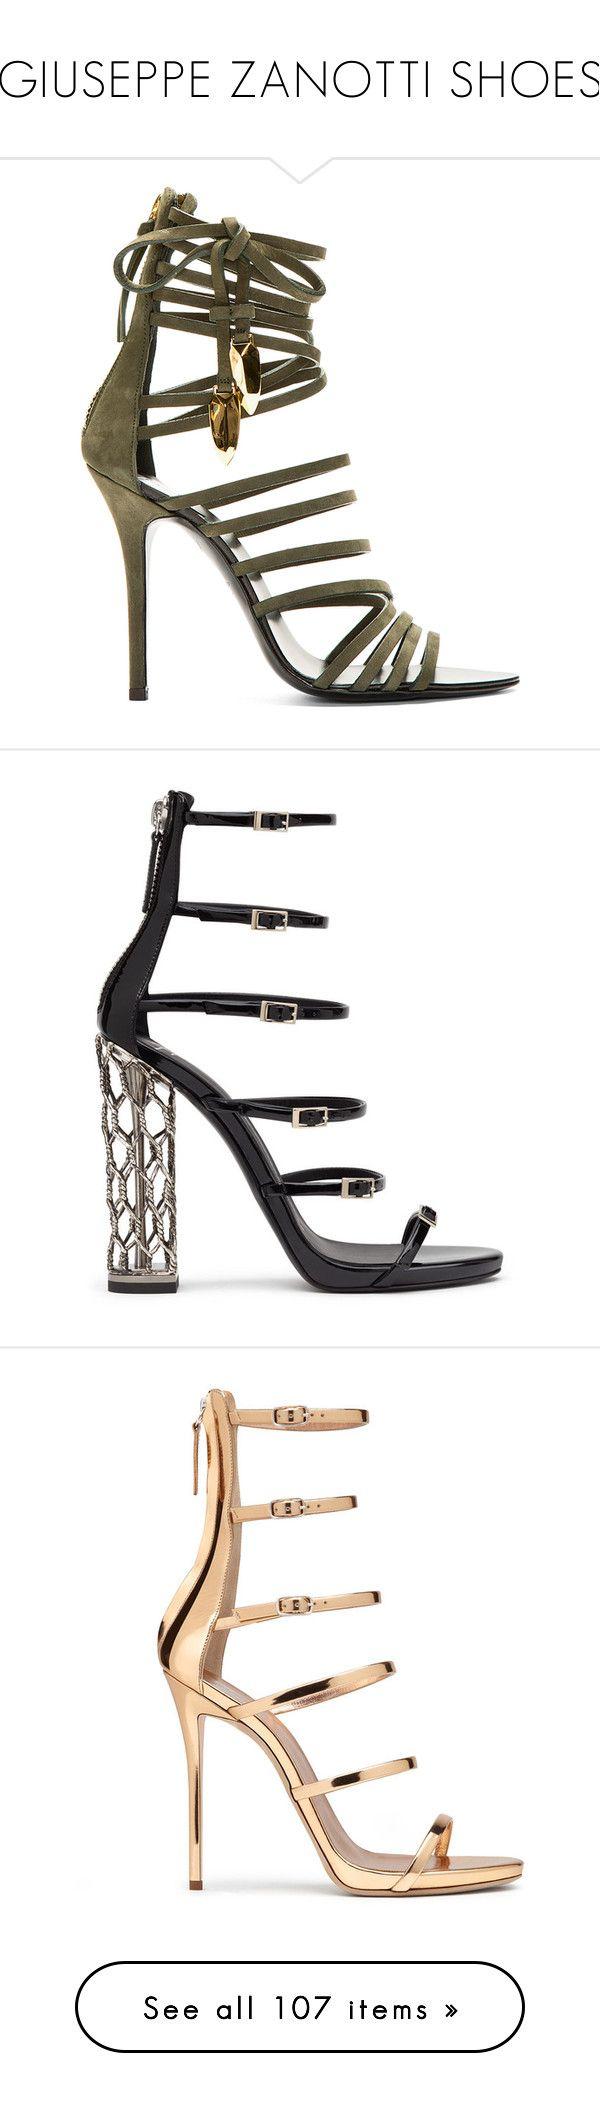 """GIUSEPPE ZANOTTI SHOES"" by khavac ❤ liked on Polyvore featuring shoes, sandals, heels, giuseppe zanotti, high heeled footwear, high heel gladiator sandals, strap heel sandals, tie gladiator sandals, strappy high heel sandals and kohl shoes"